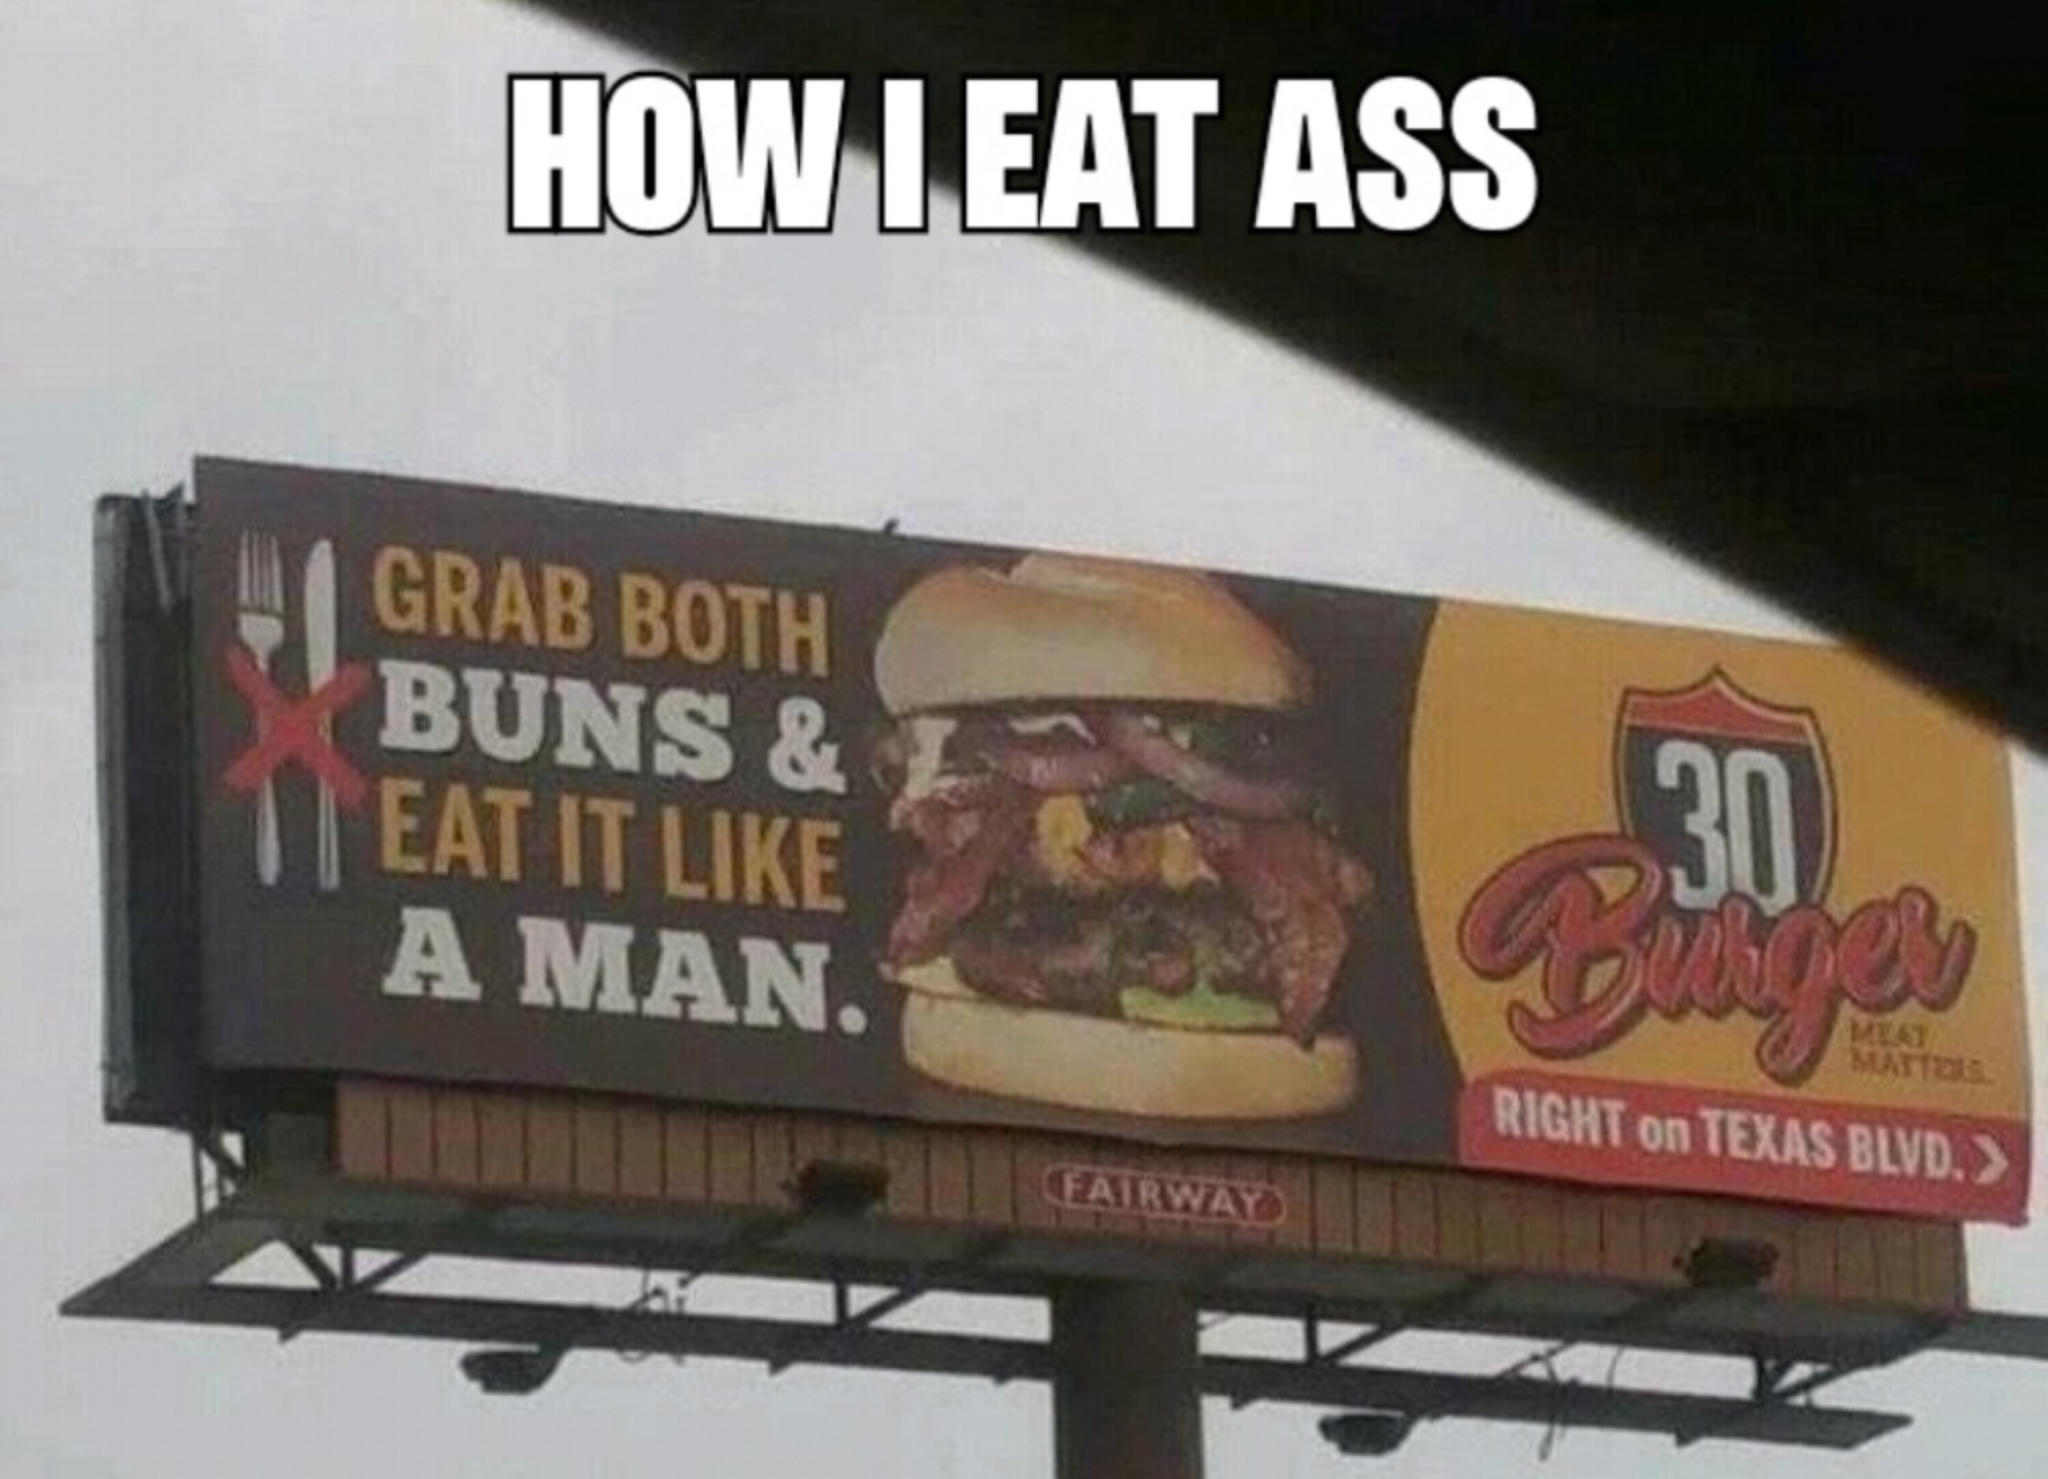 How Leat Ass Grab Both Buns 30 I Eat It Like E3 80 81la A Man